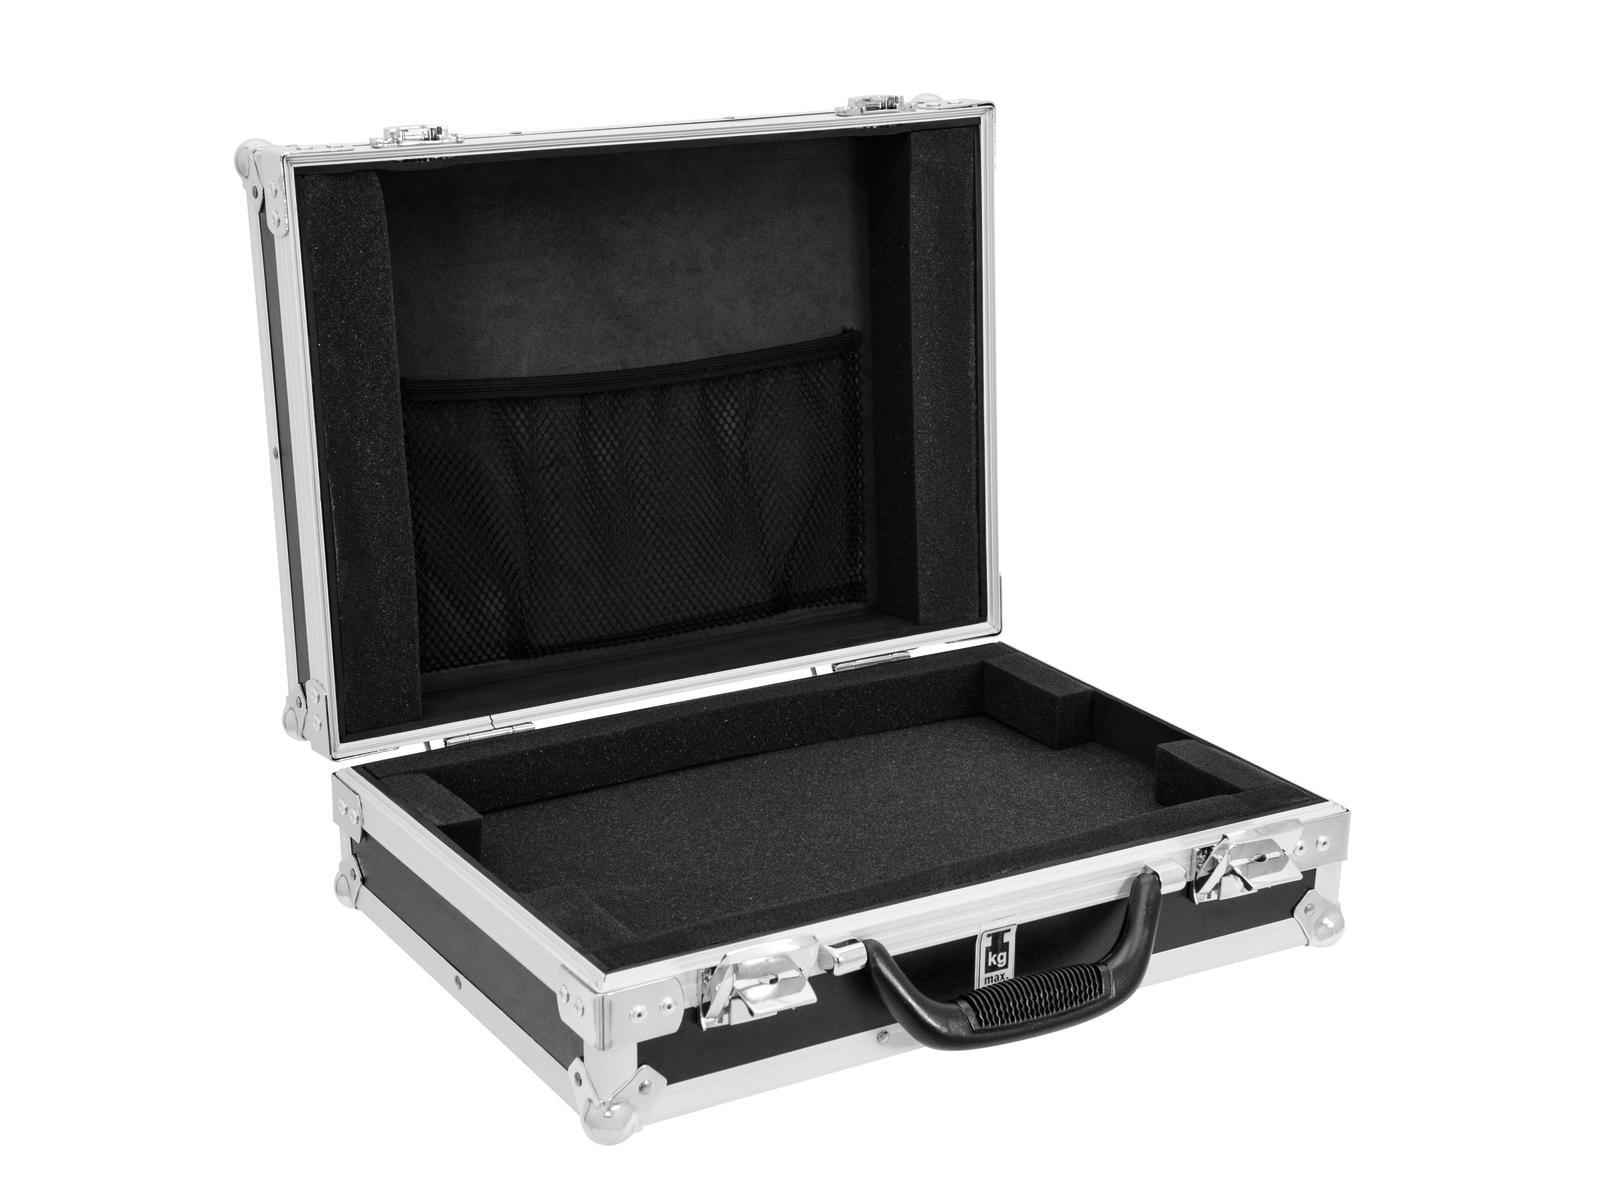 ROADINGER Laptop-Case LC-13 maximal 325x230x30mm